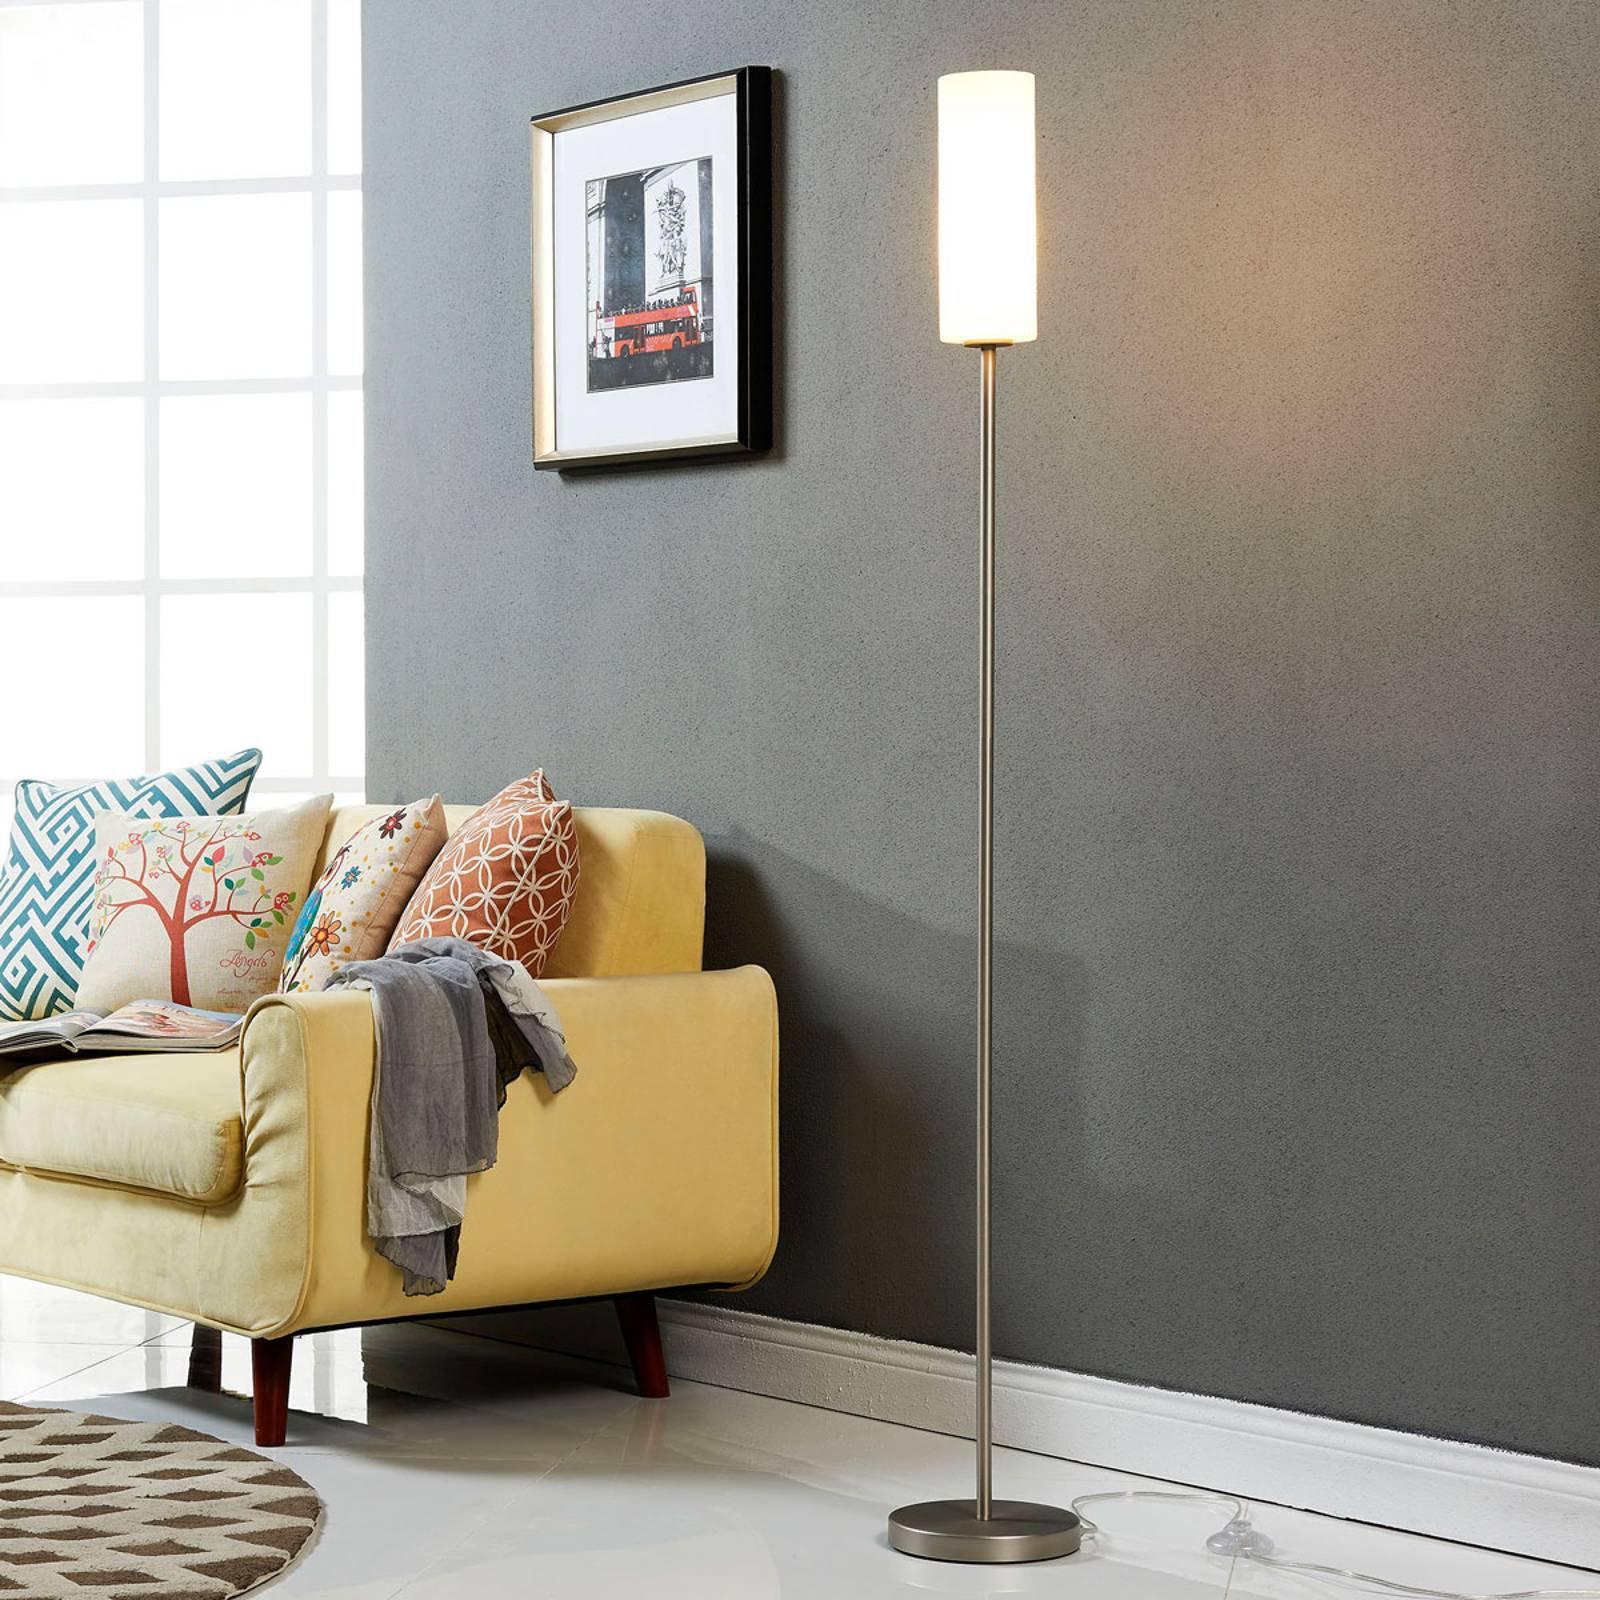 Diskret stålampe Vinsta med smal glasskjerm